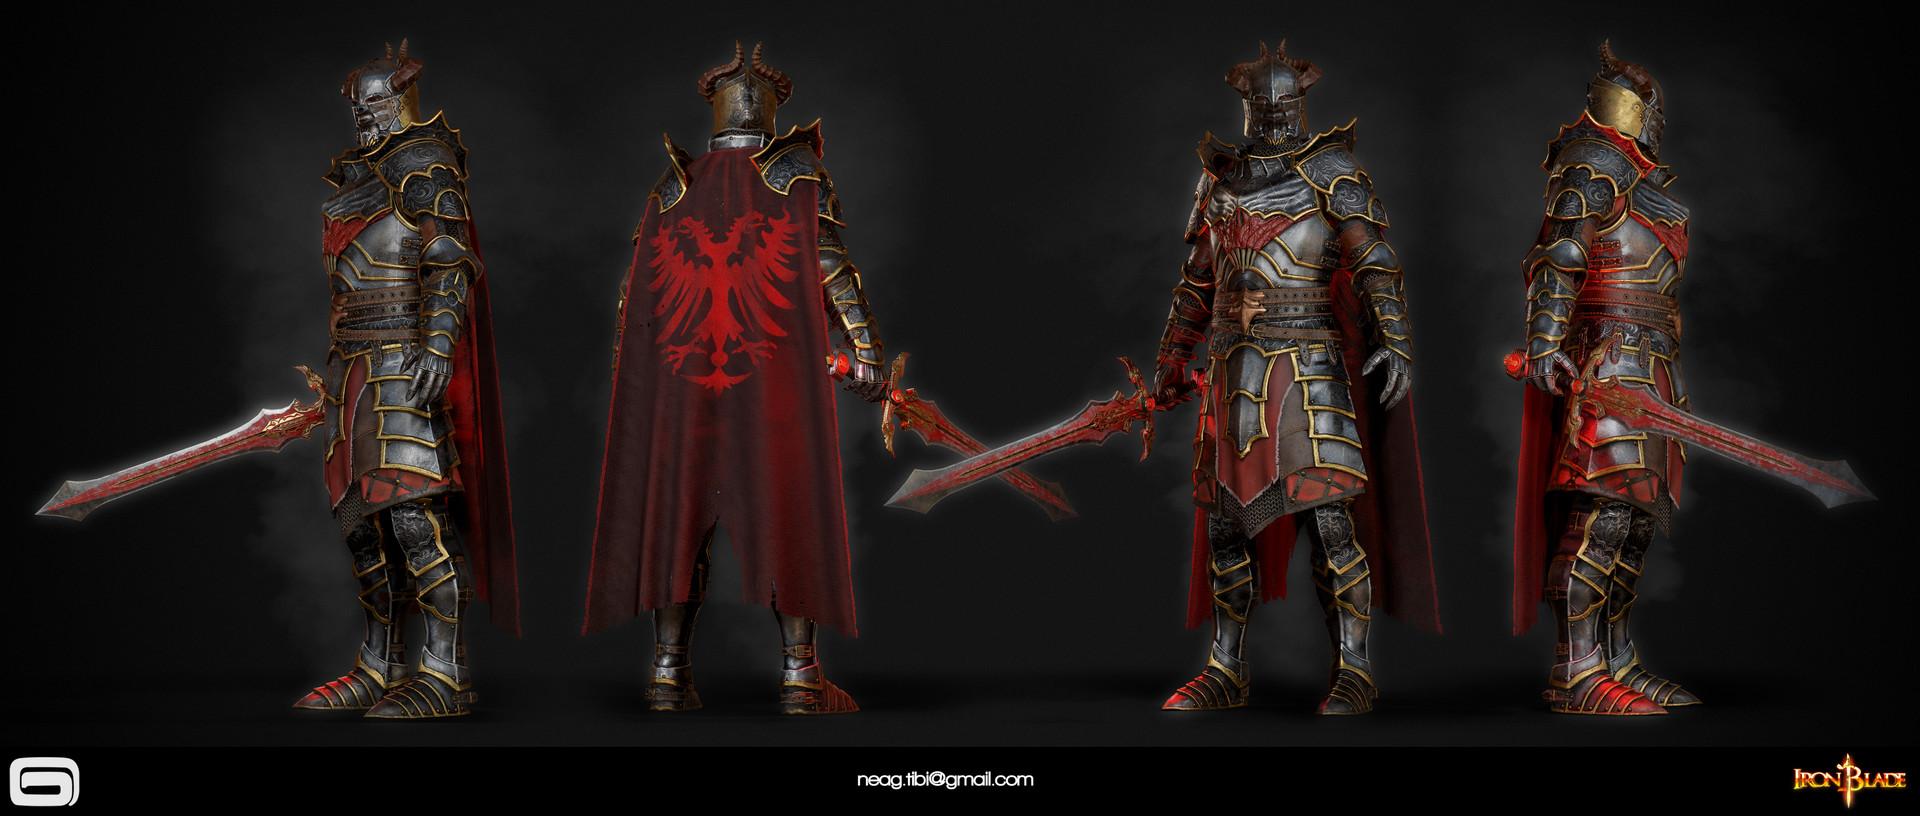 Tibi neag tibi neag iron blade mc armor 10c low poly 01